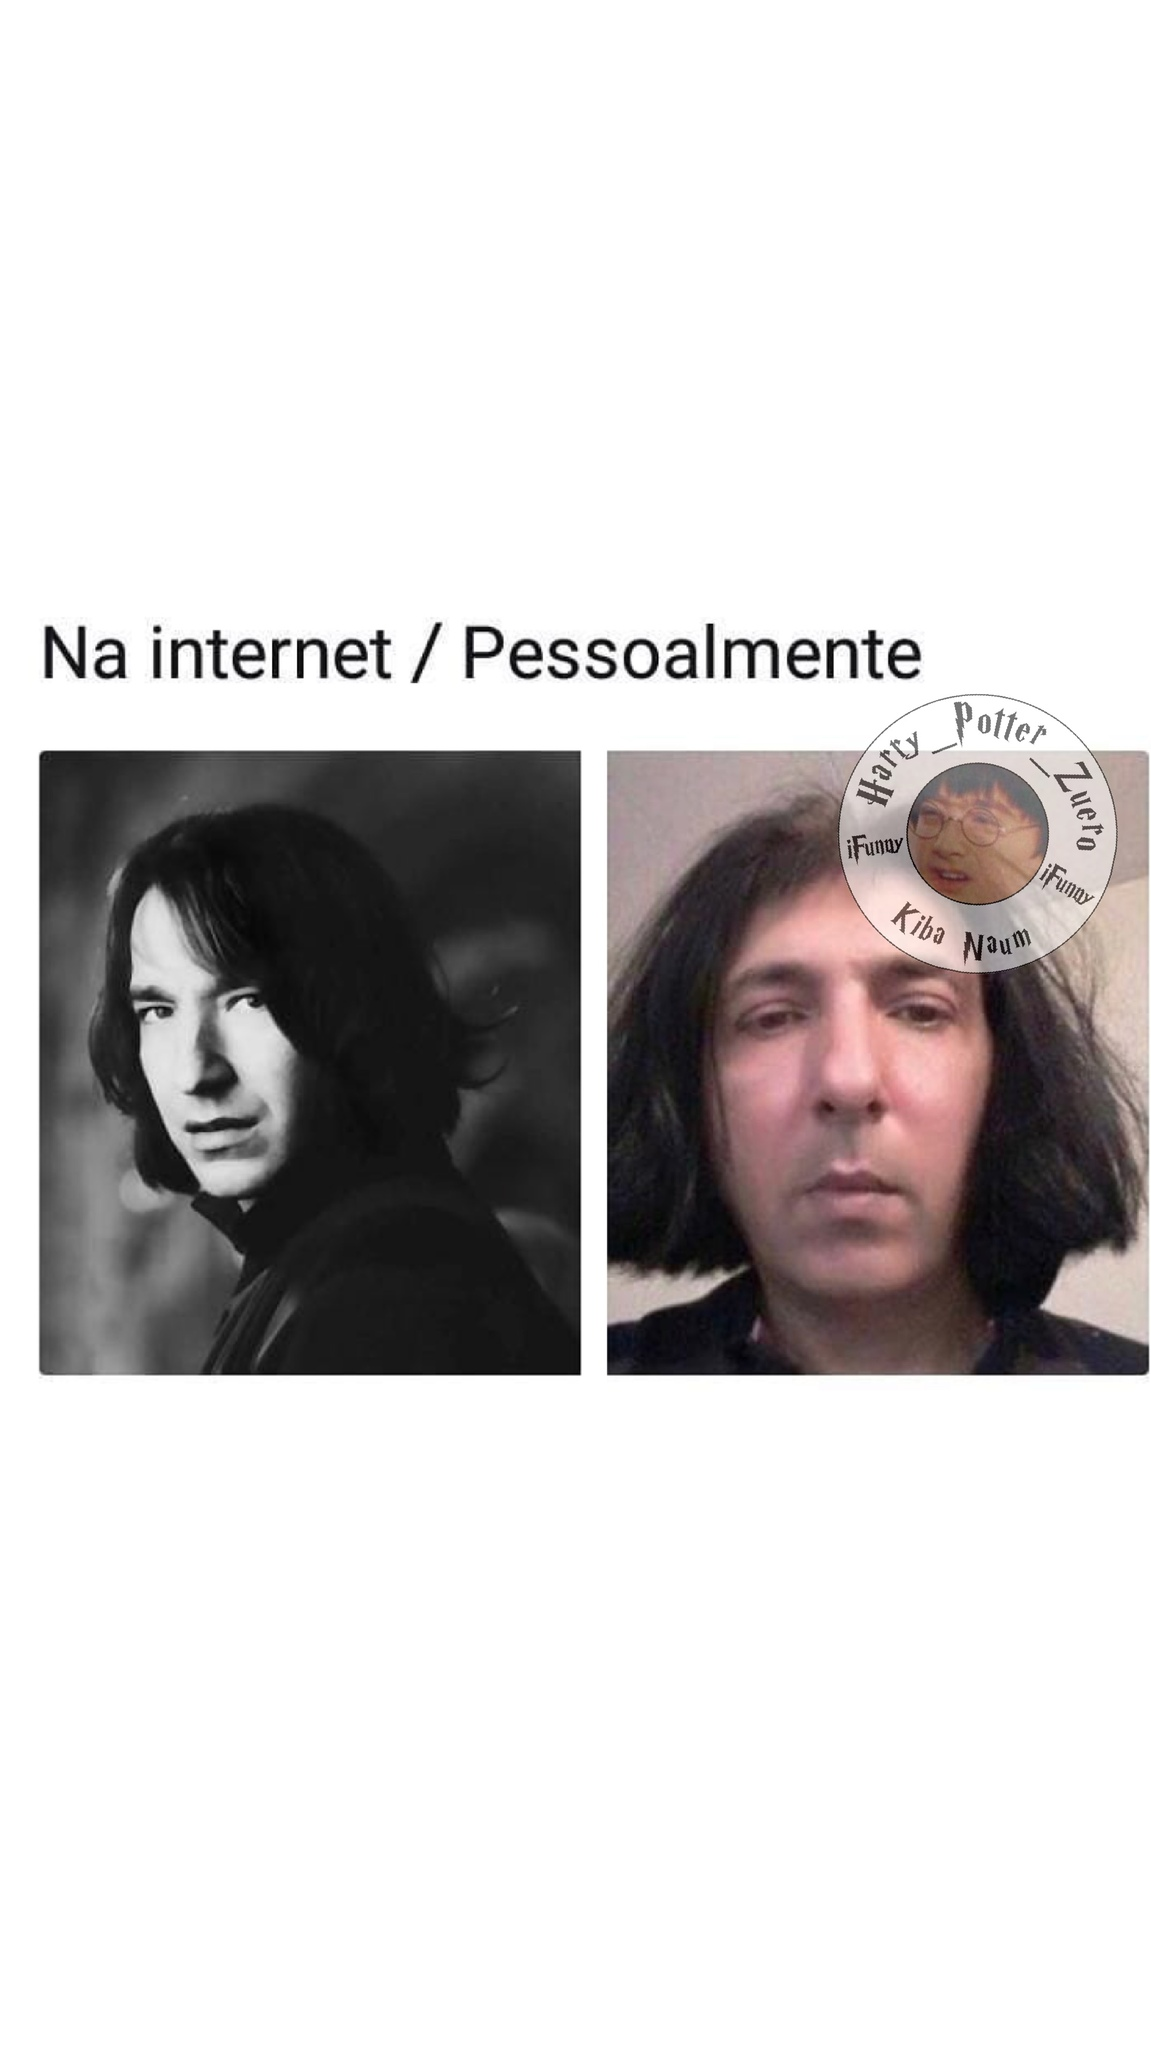 nosa isnaip - meme